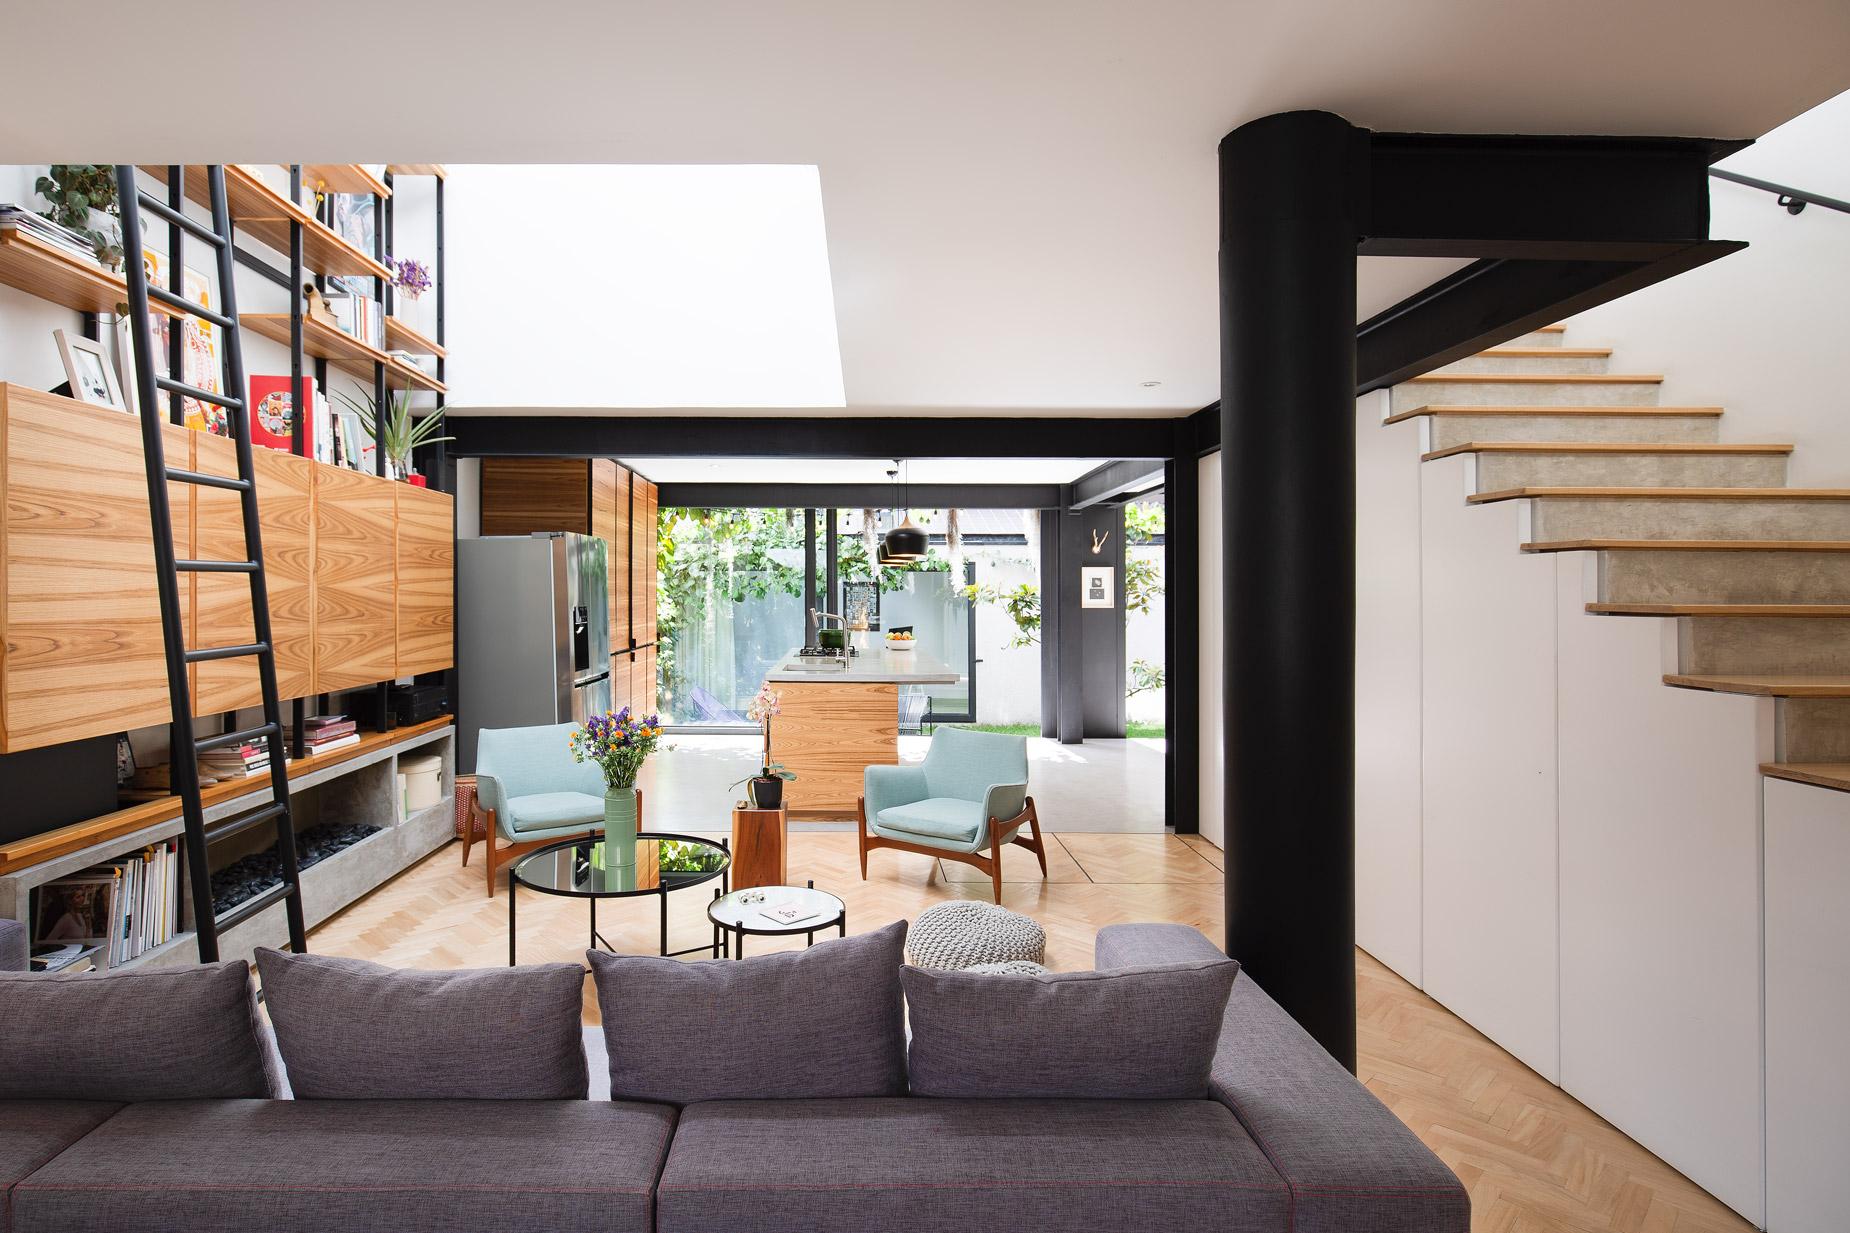 18.oberlaenderarquitectos.arquitectura.simonboschphotography.simon.bosch.bogota.interior.habitar